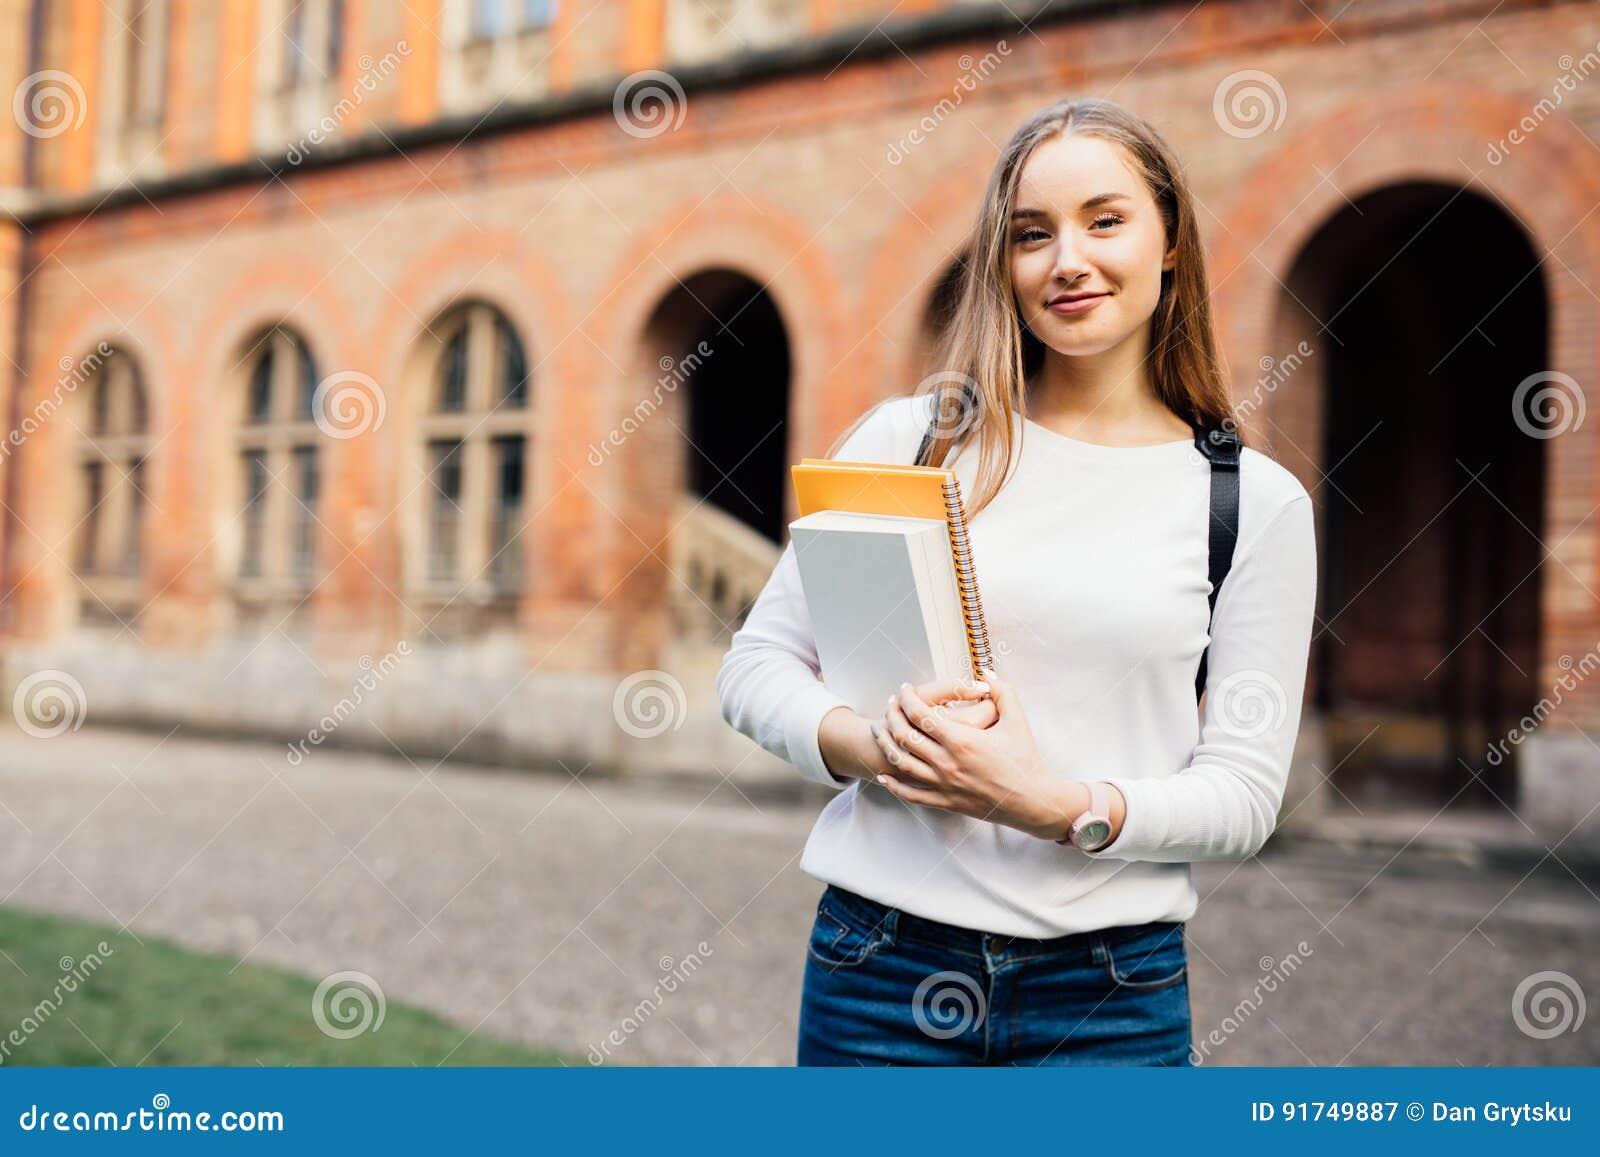 Female college student. Happy girl in european university for scholarship.